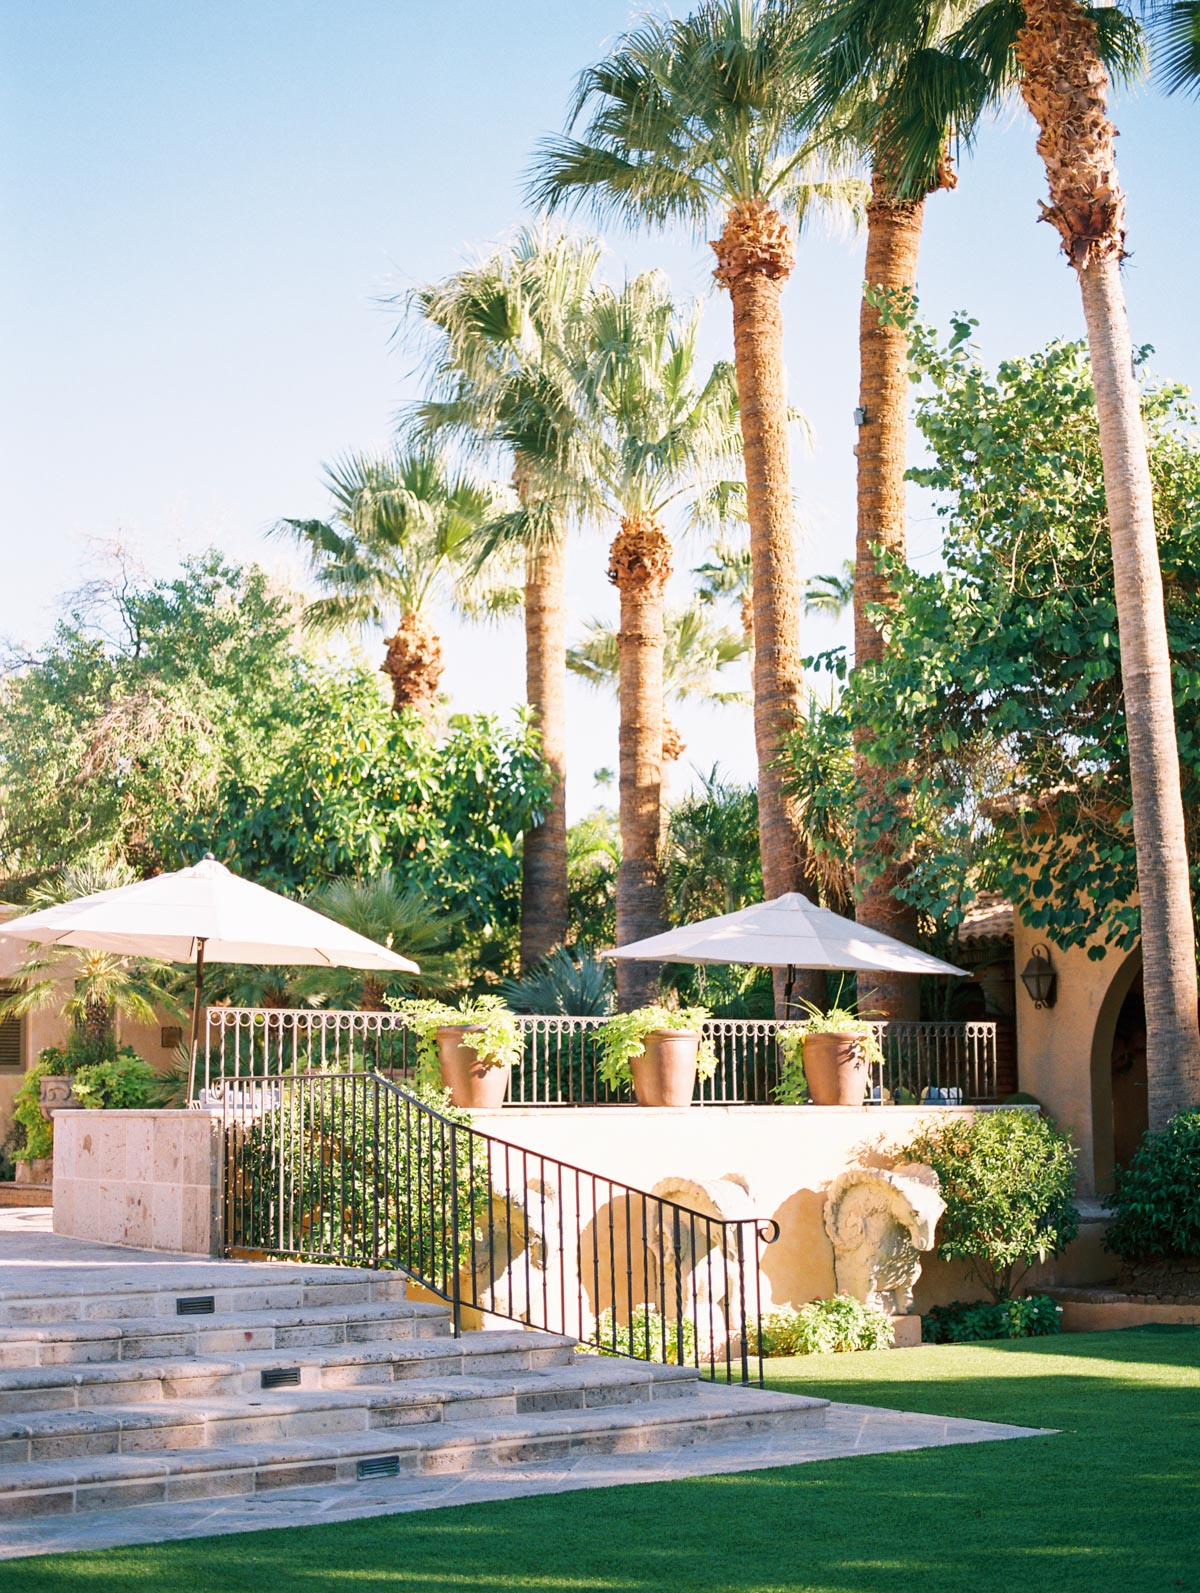 royal-palms-resort-2.jpg